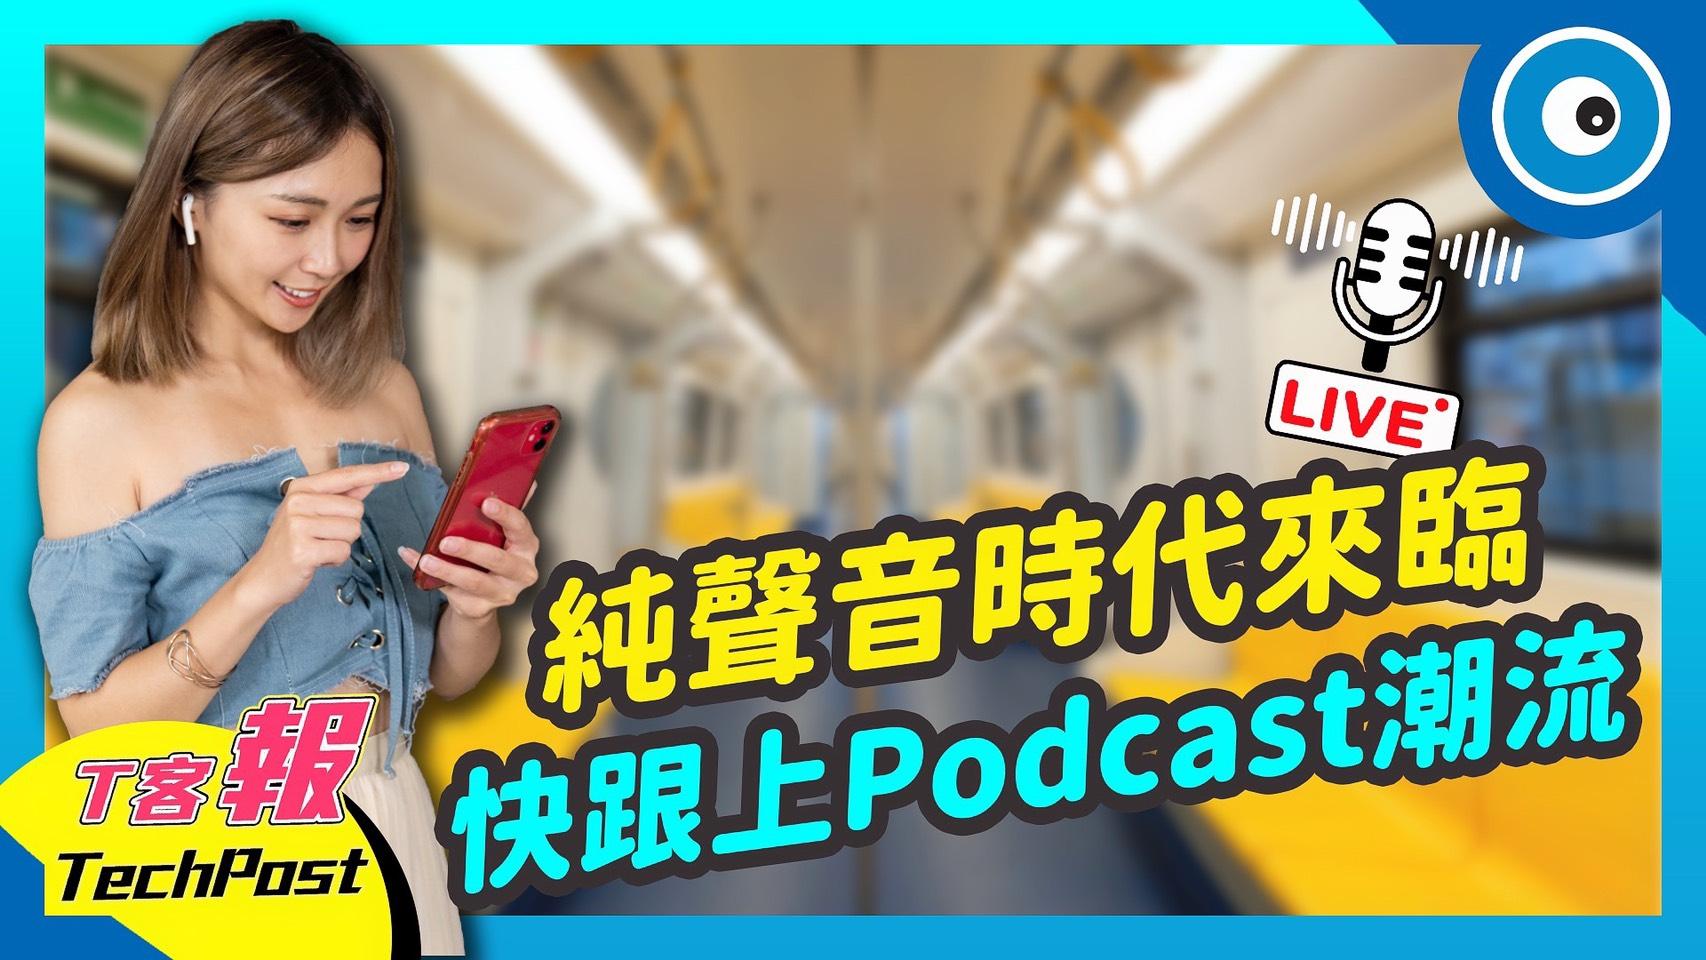 Podcast 迅速竄紅,各大 Youtuber 也紛紛轉戰,而對於聽眾而言,一個好的收聽平台該具備什麼樣的條件呢